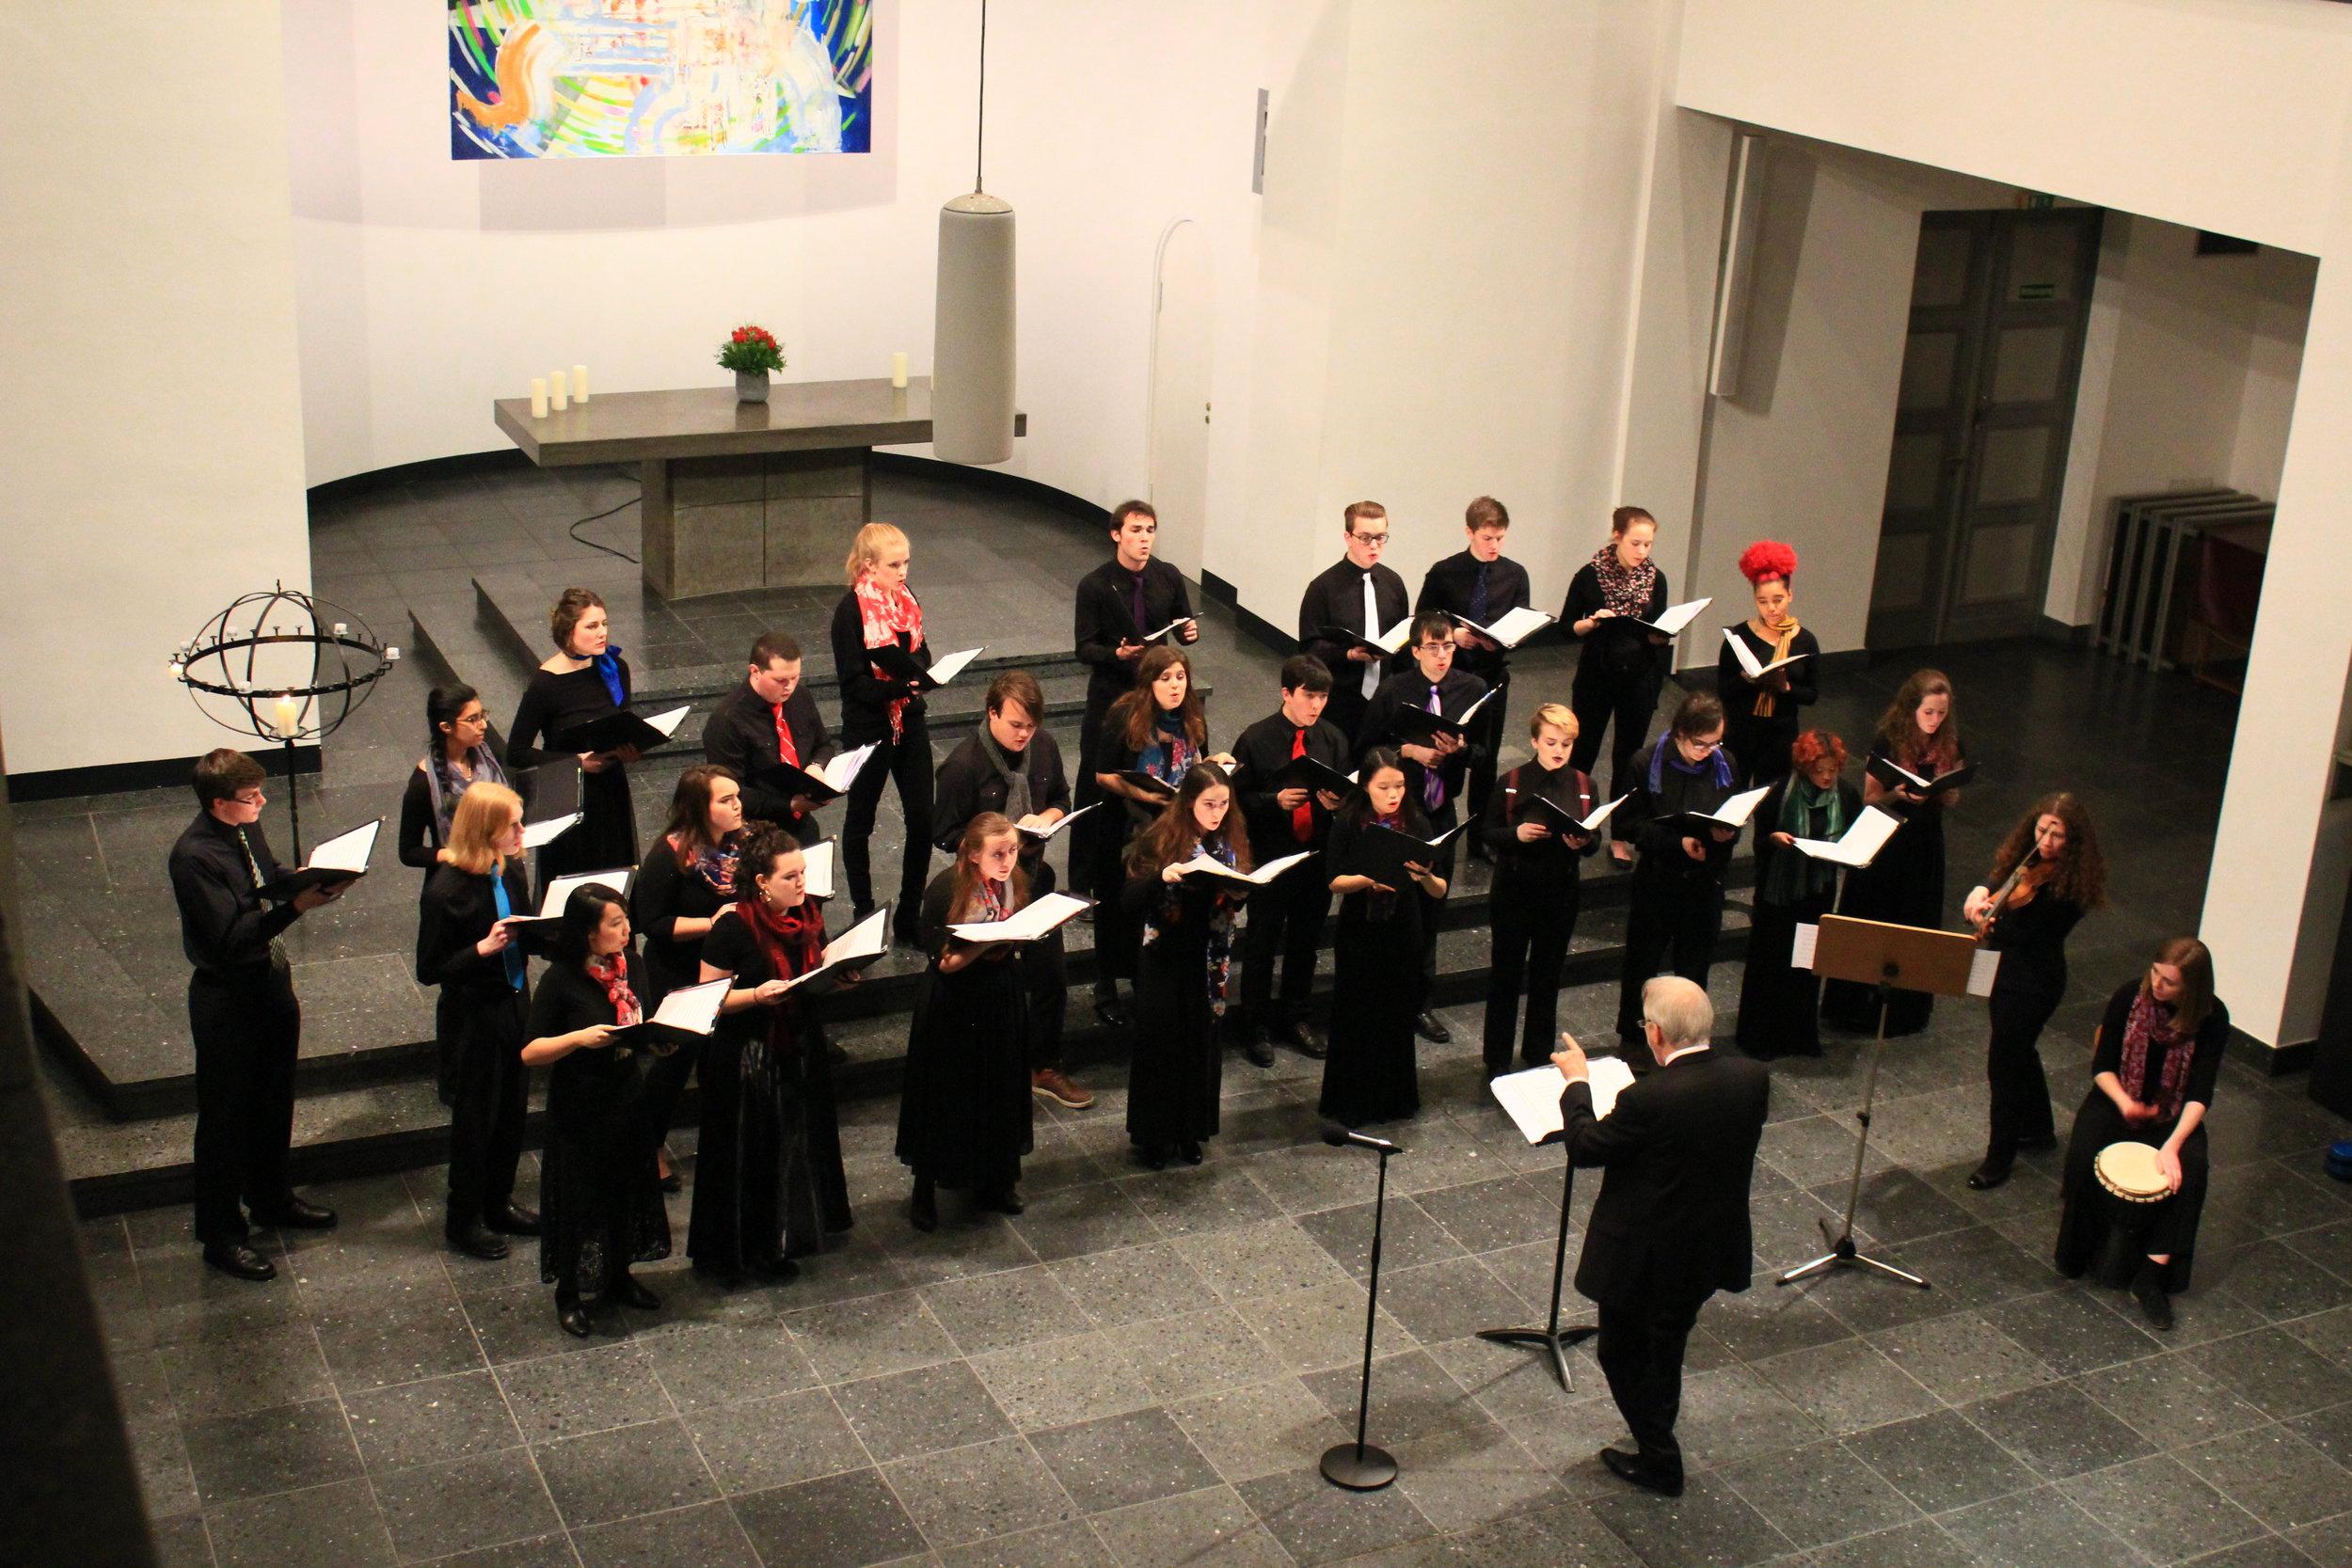 Chamber Singers performing 'Vogelgesang' in St. Matthäus Kirche